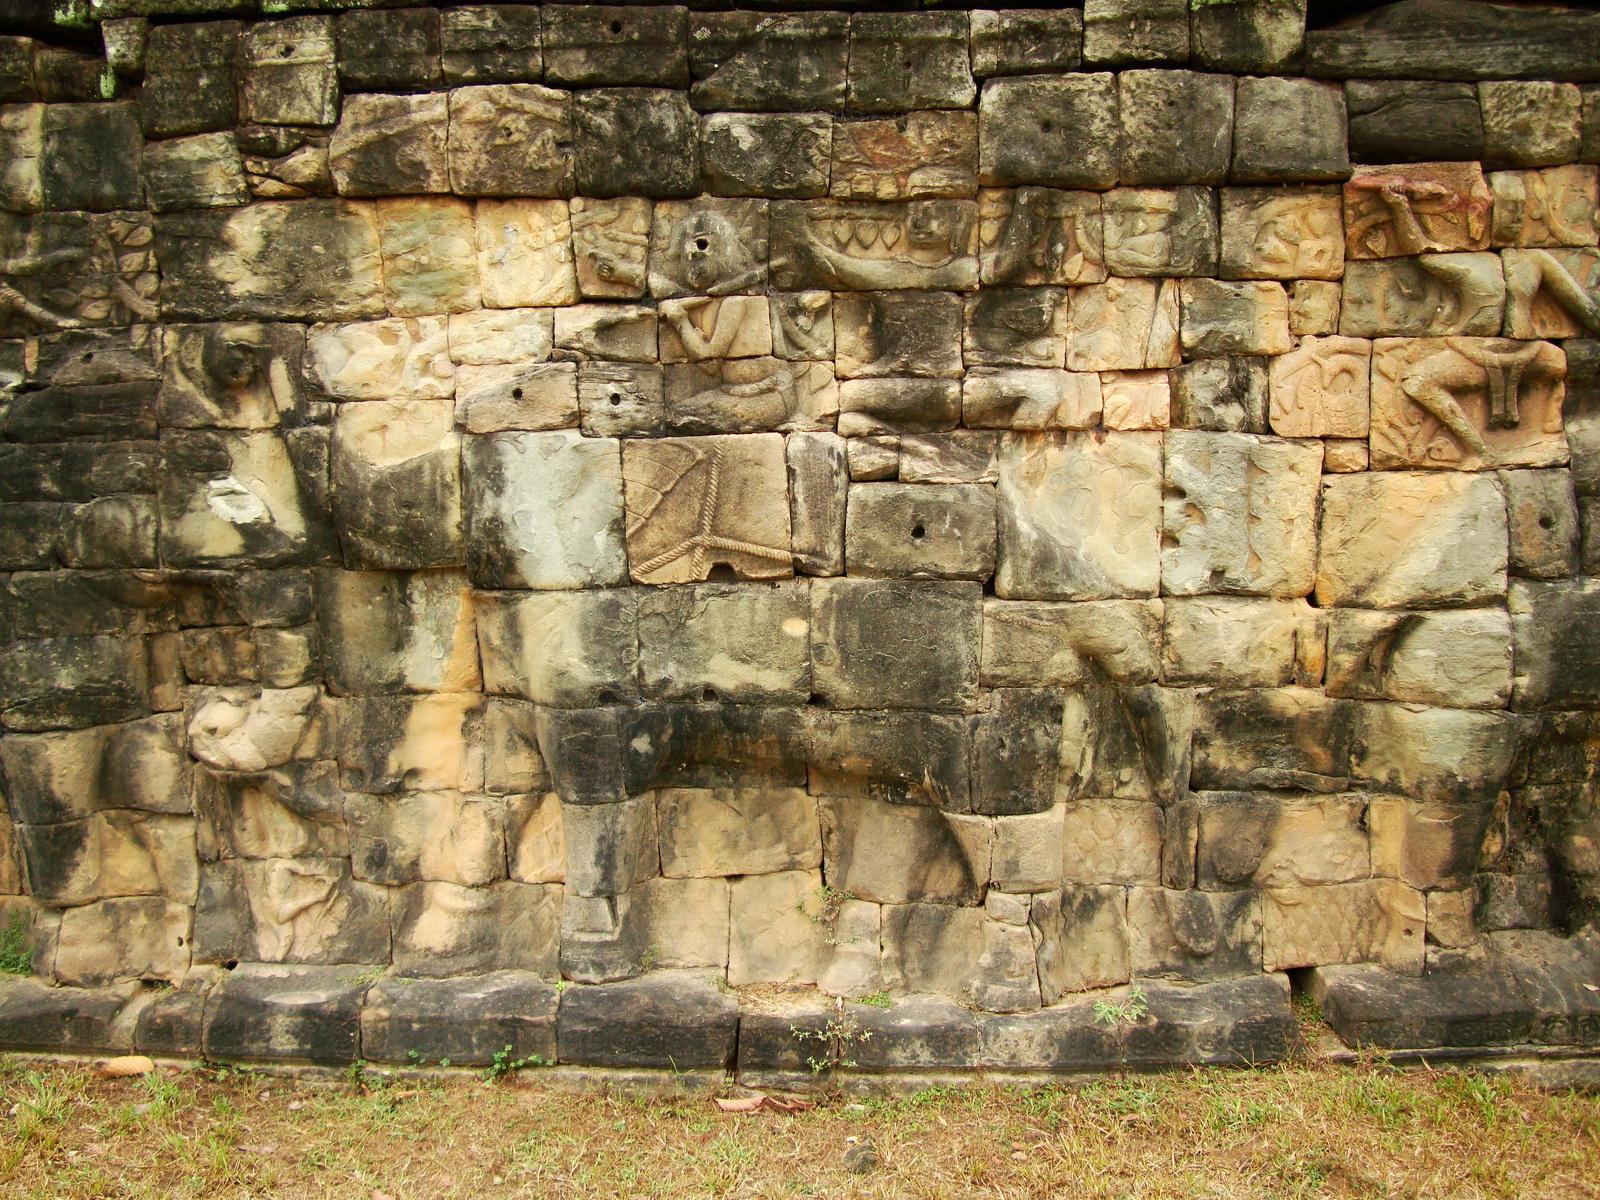 Terrace of the Elephants Bas reliefs hunting scenes 09